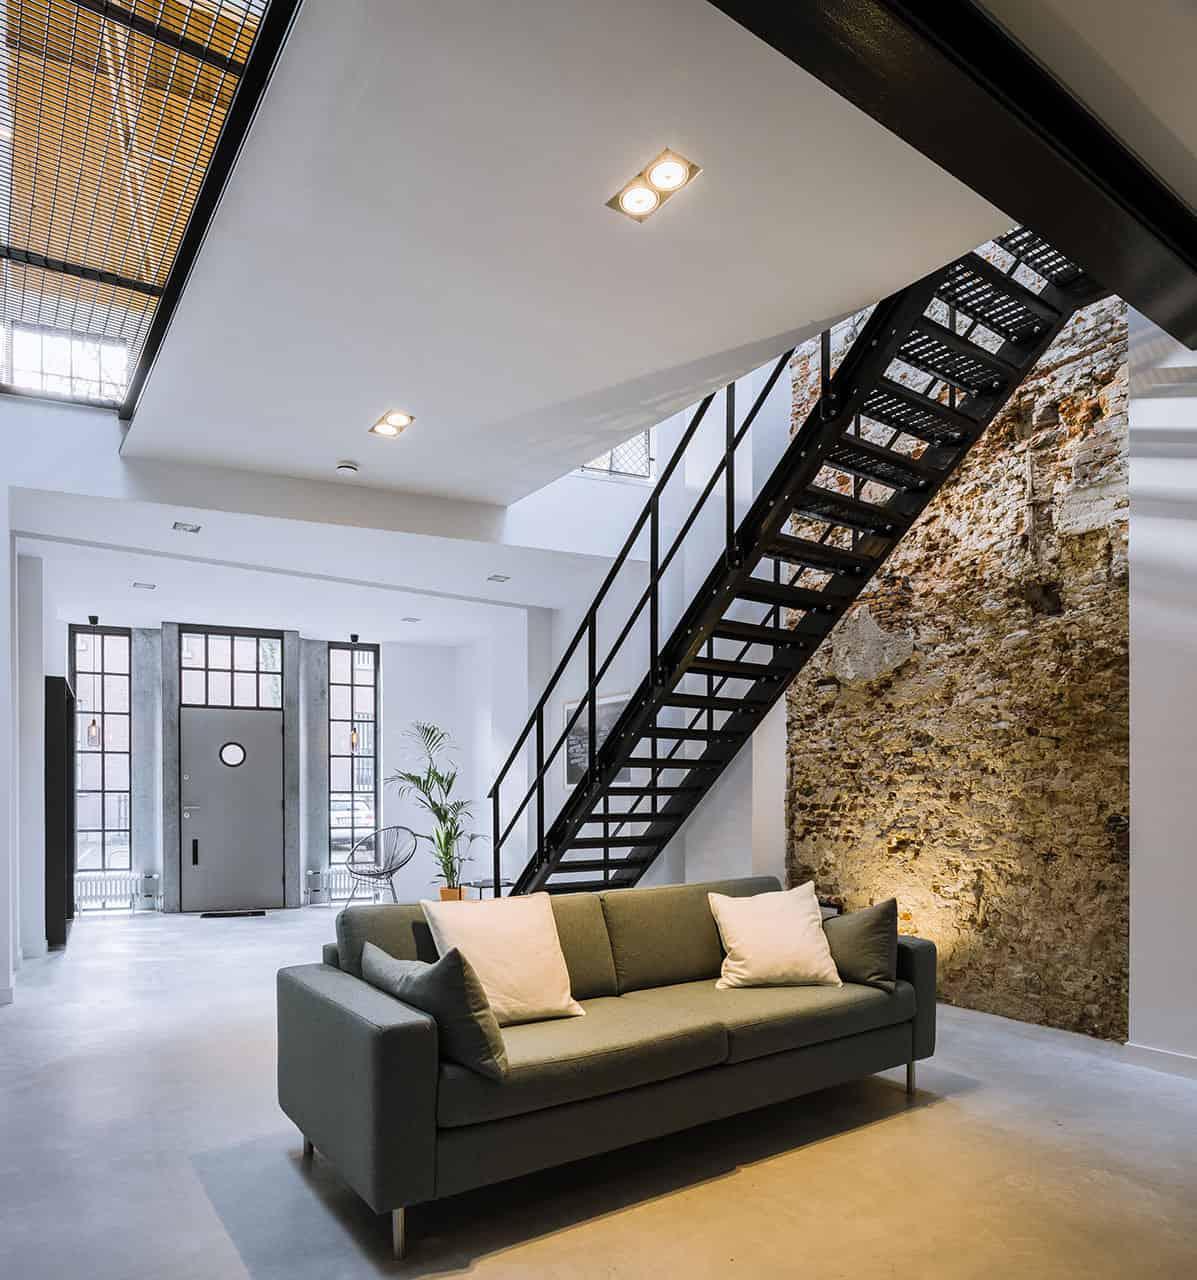 101 Beautiful Formal Living Room Design Ideas (2018 Images)